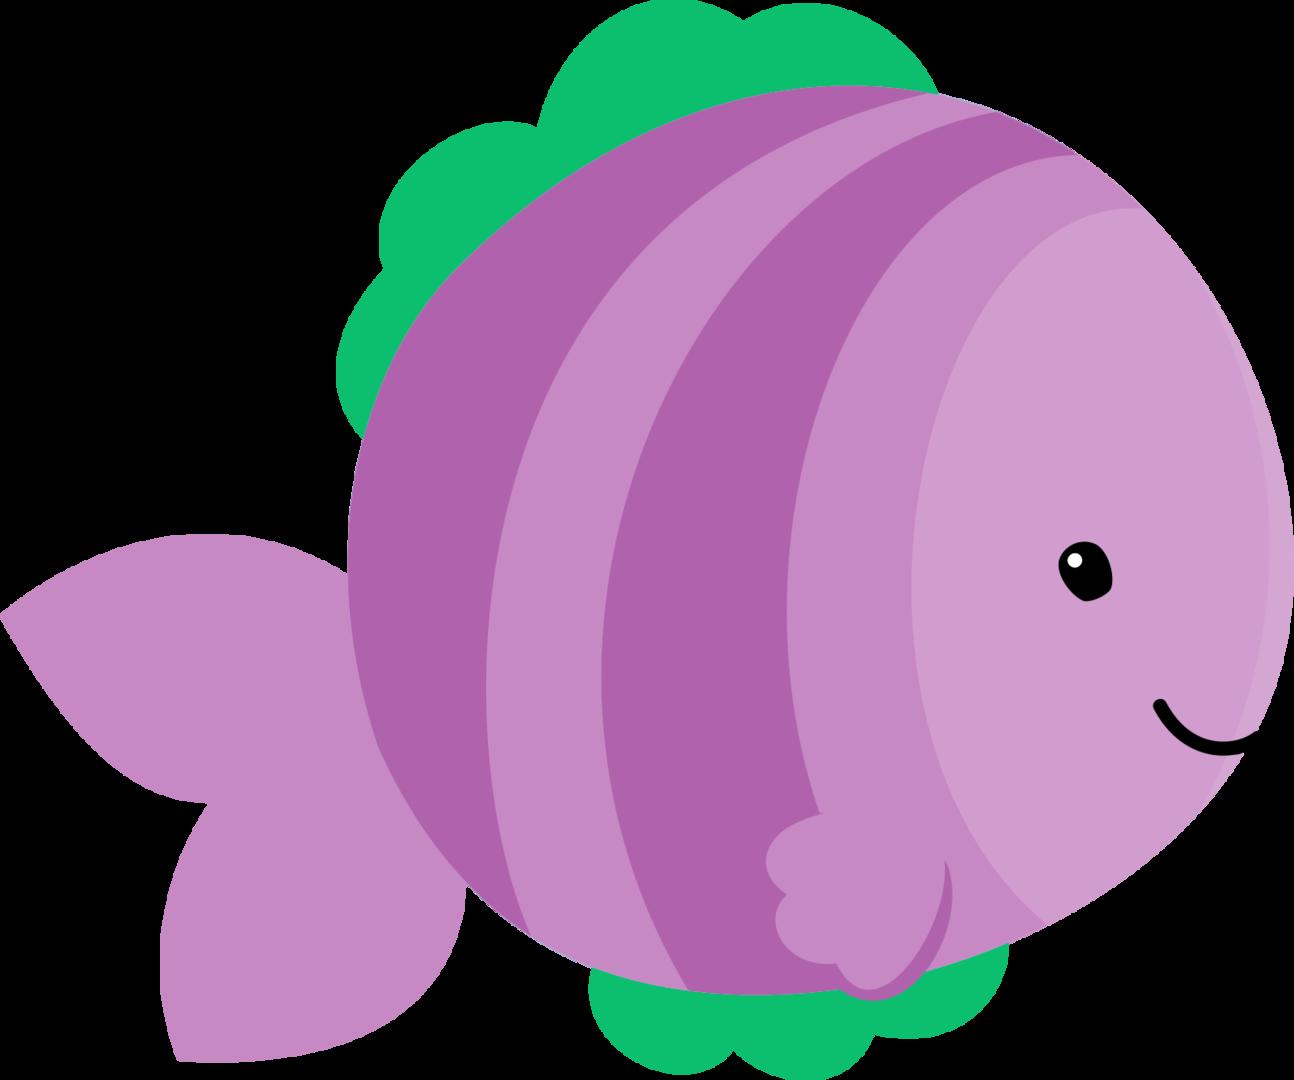 shared exibir todas. Manatee clipart purple